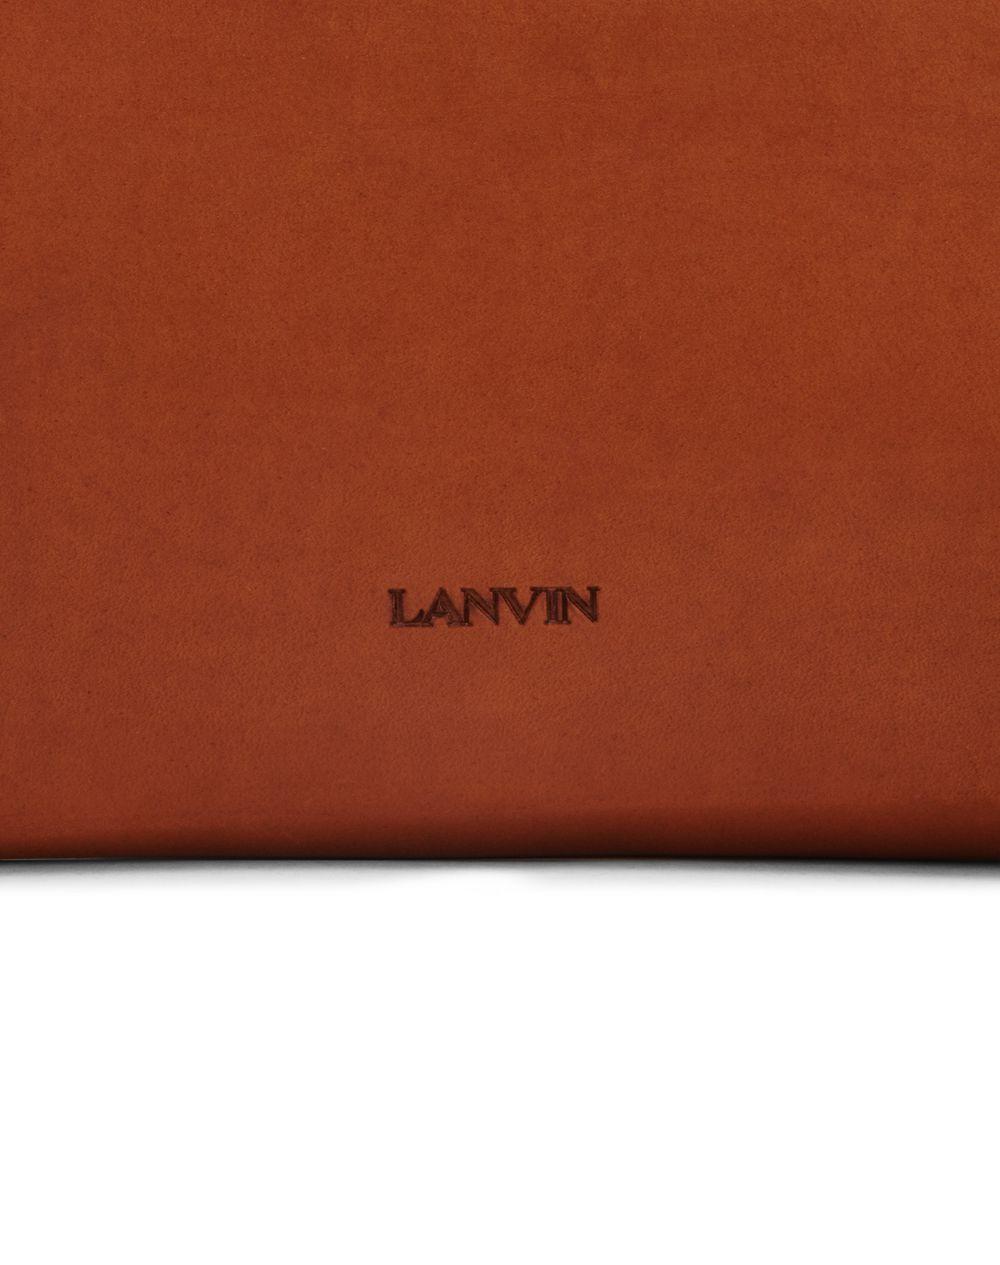 MAGOT BABAR PRINT CLUTCH - Lanvin